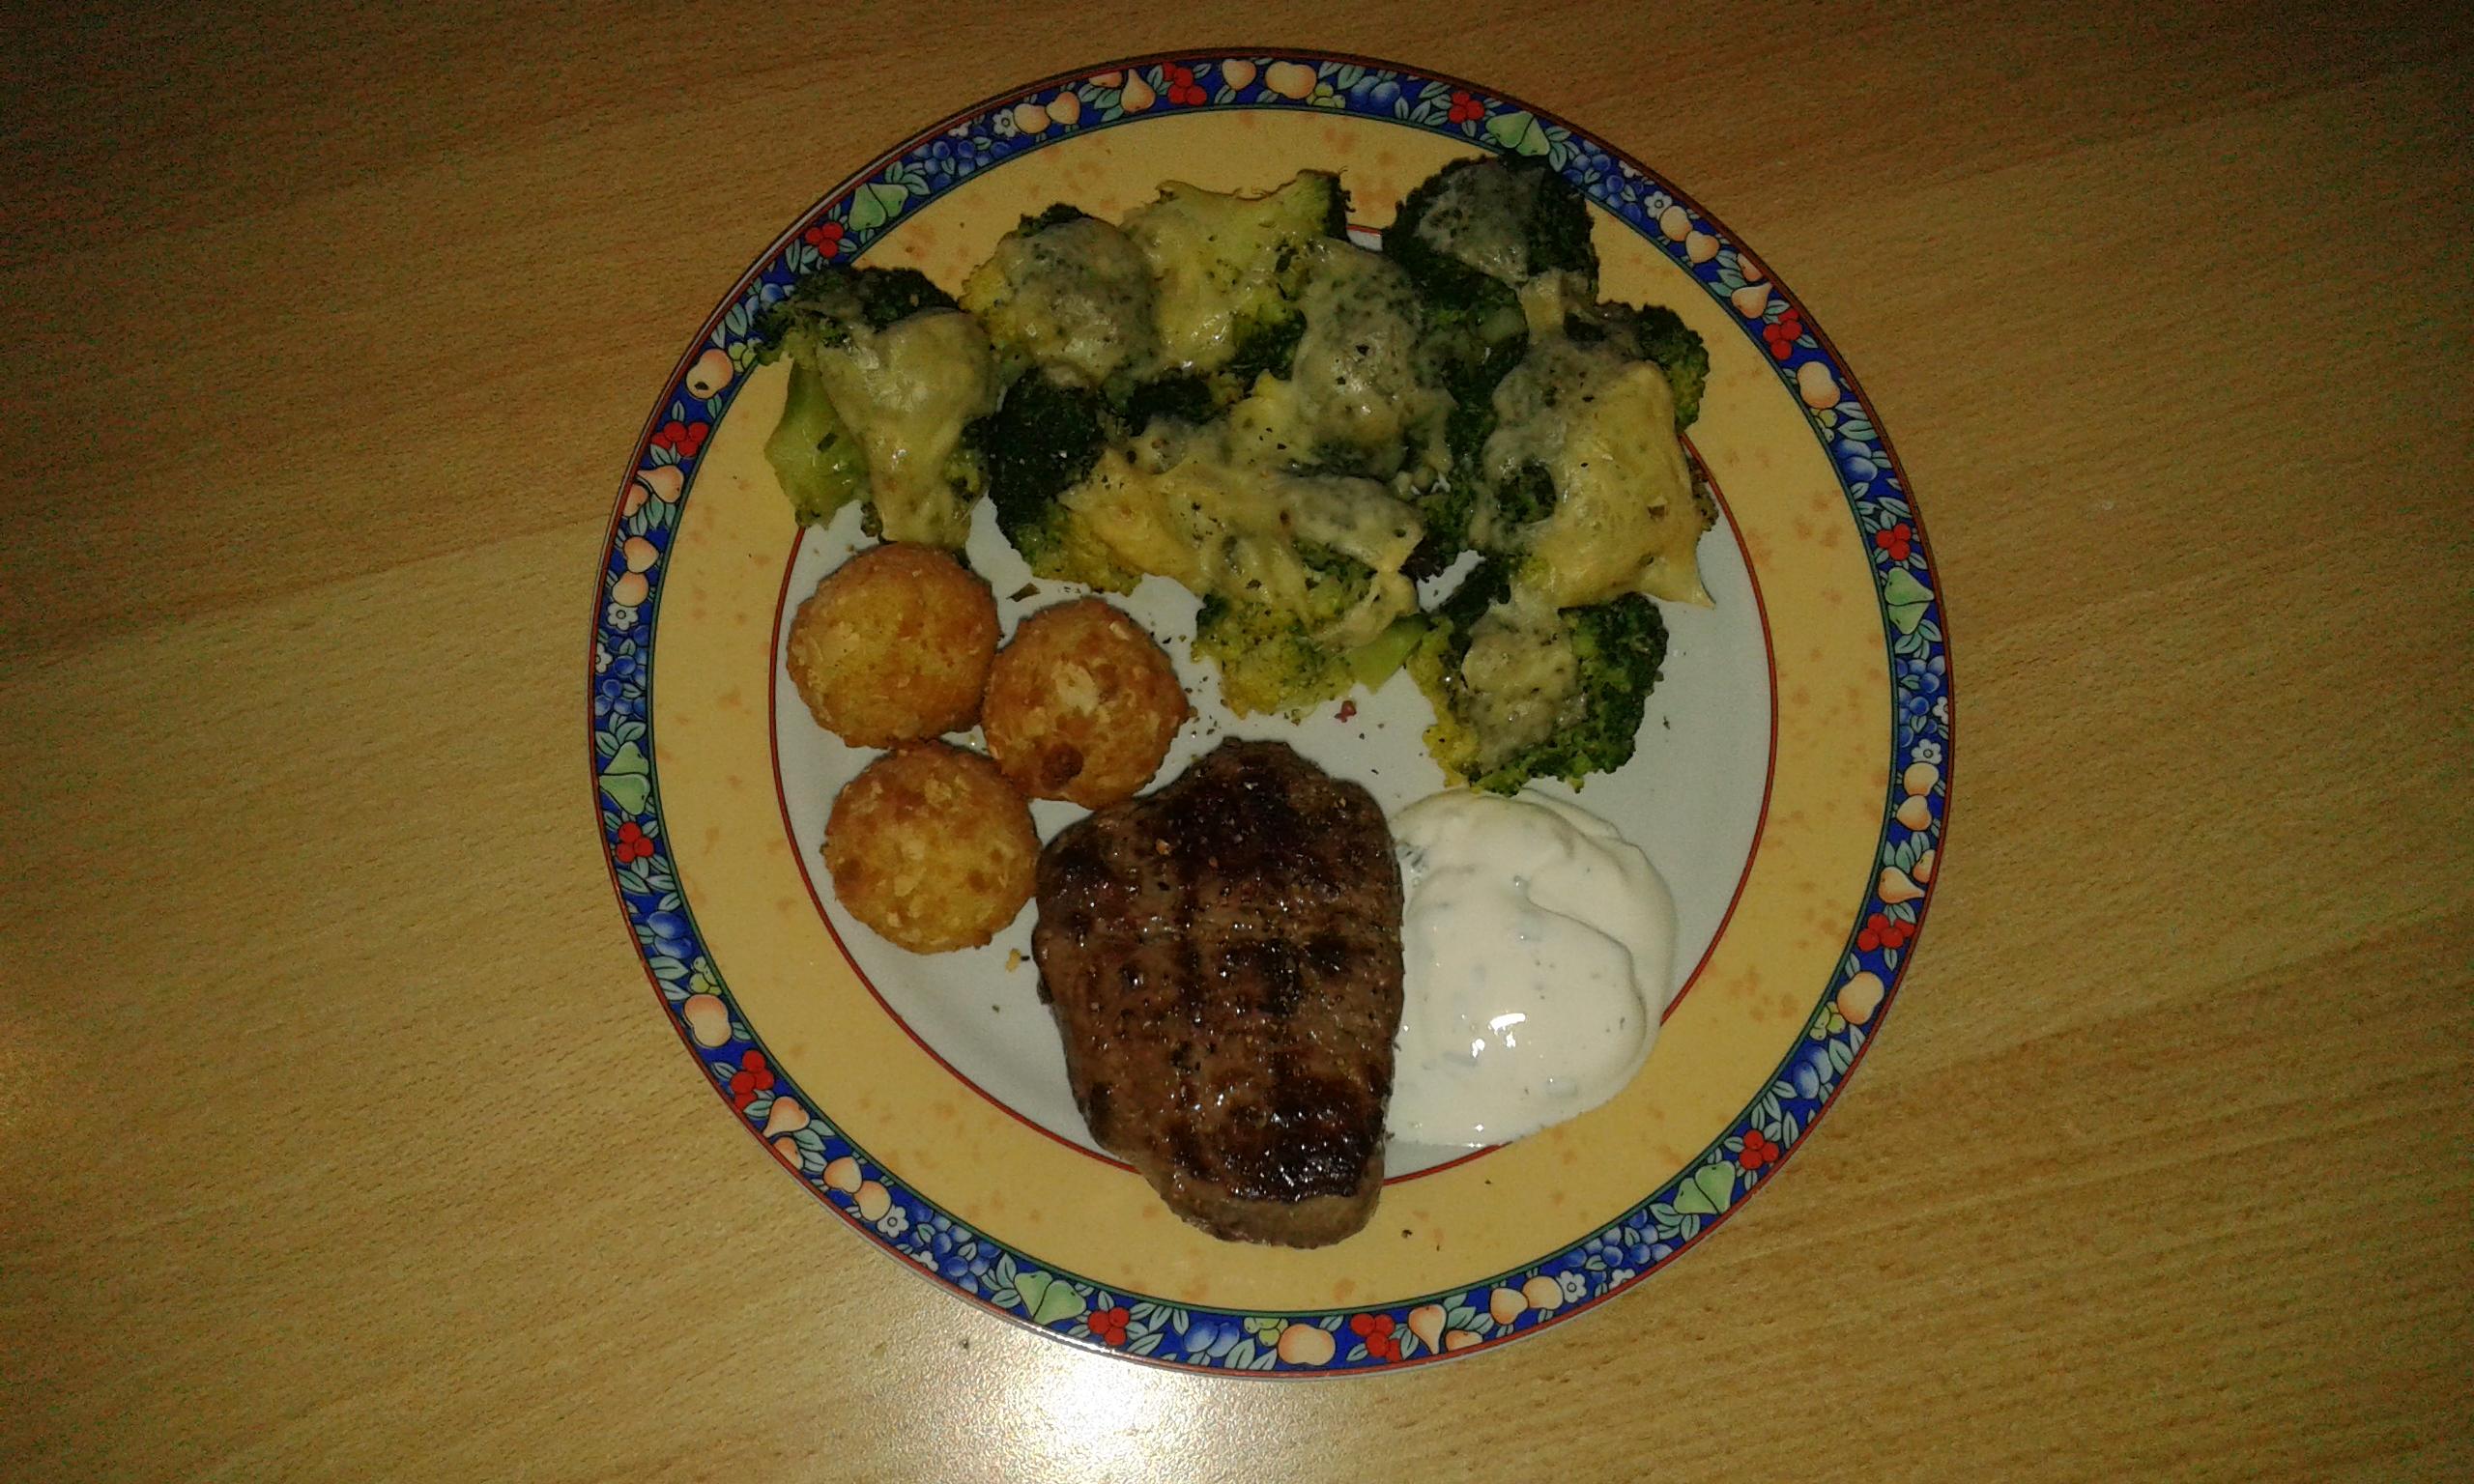 Steak mit überbackenem Brokkoli